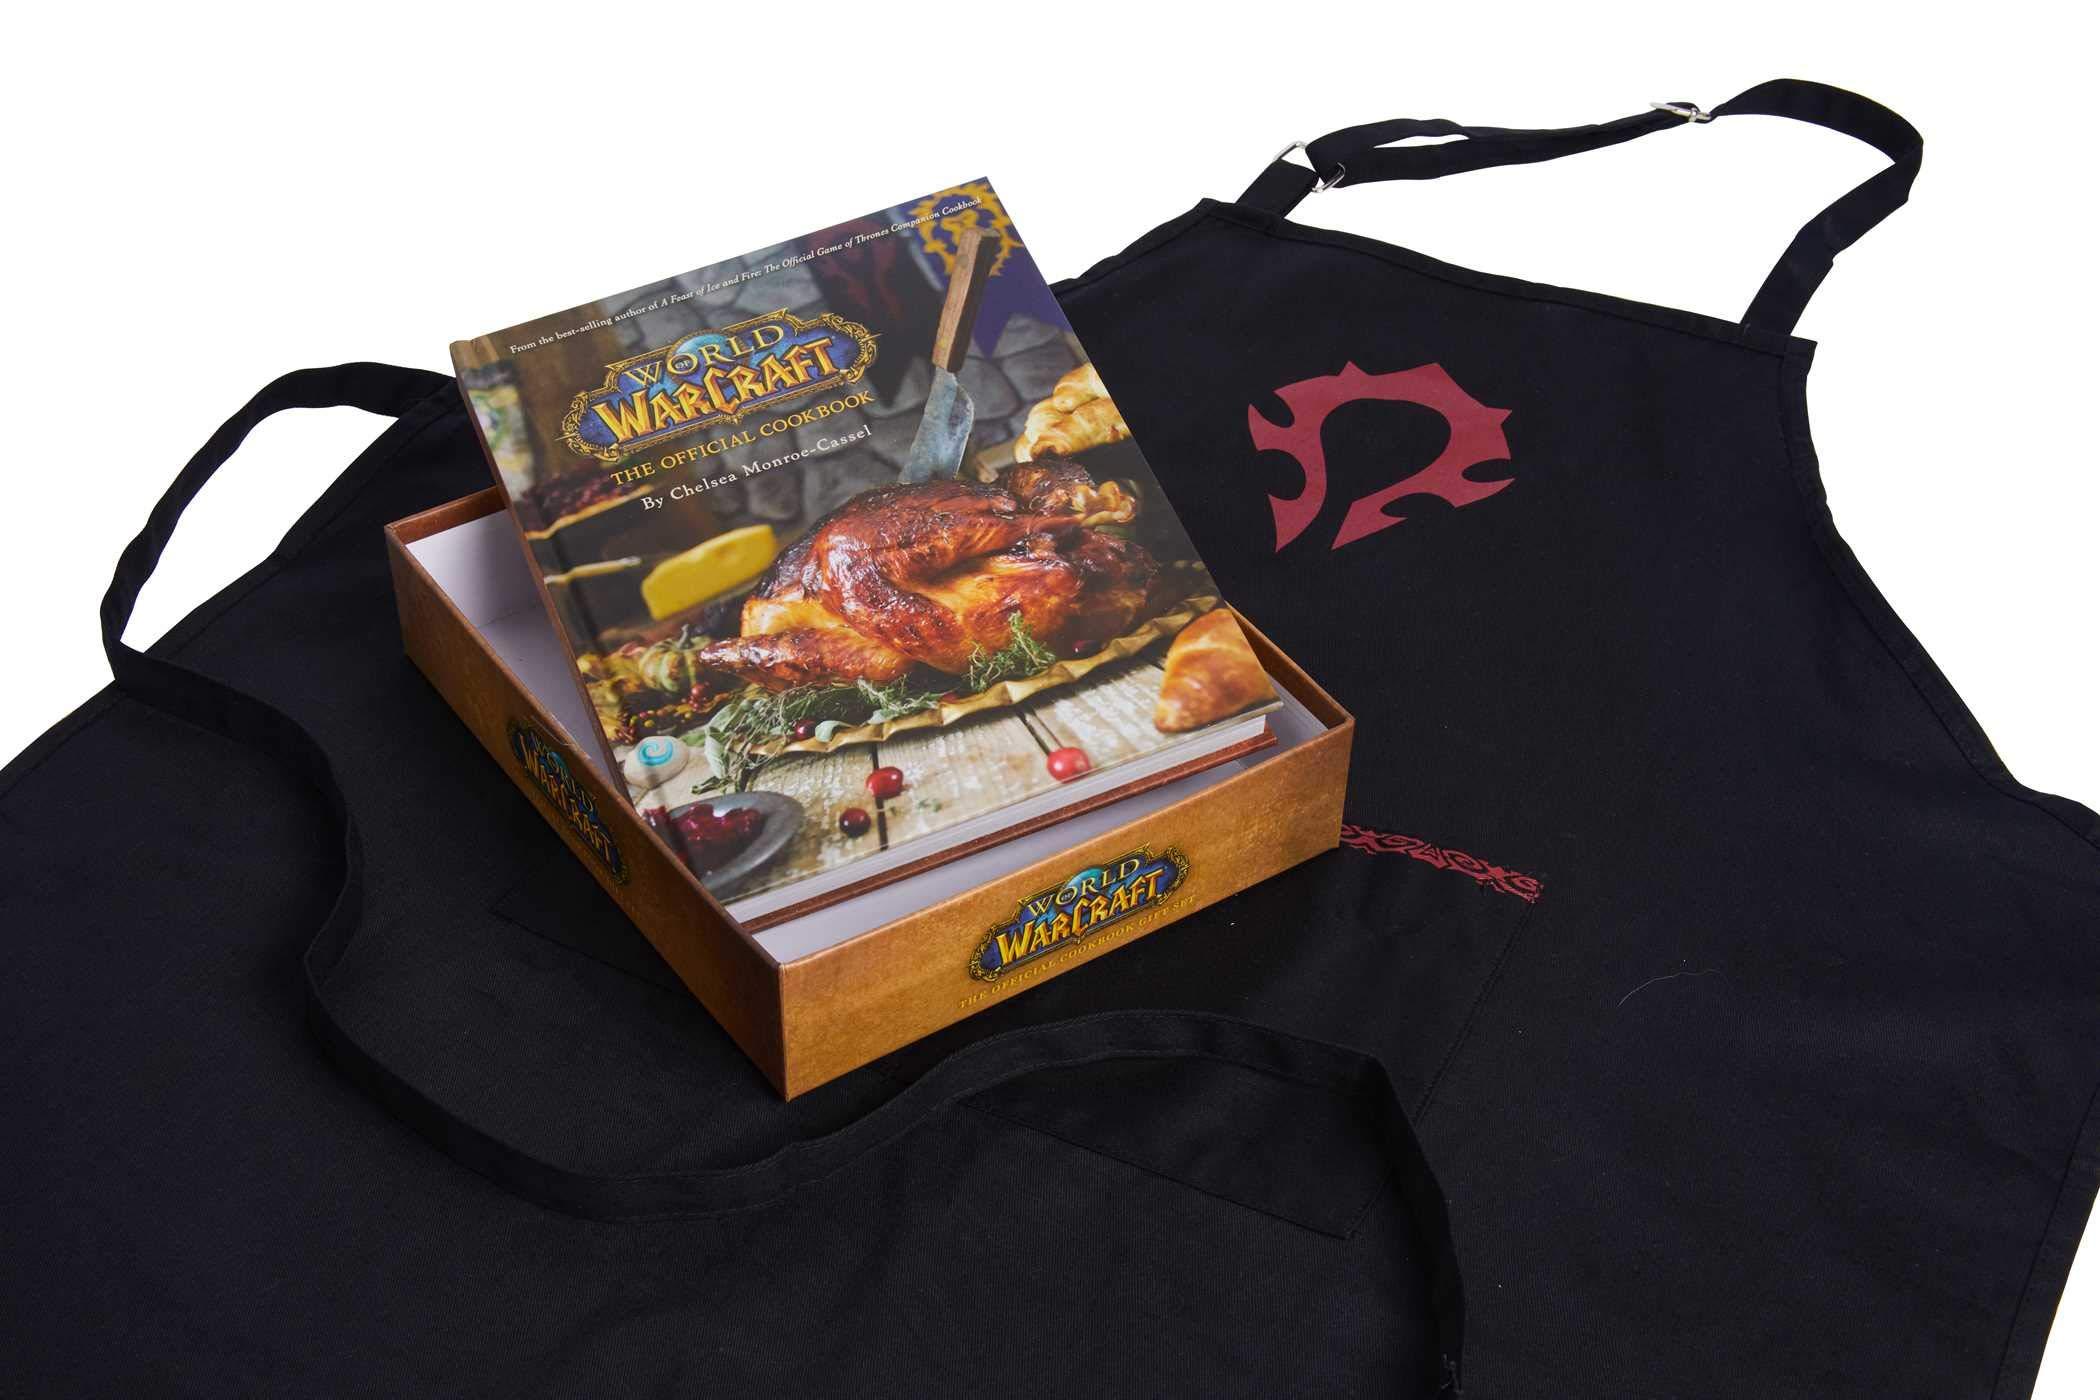 21. World of Warcraft: The Official Cookbook Gift Set